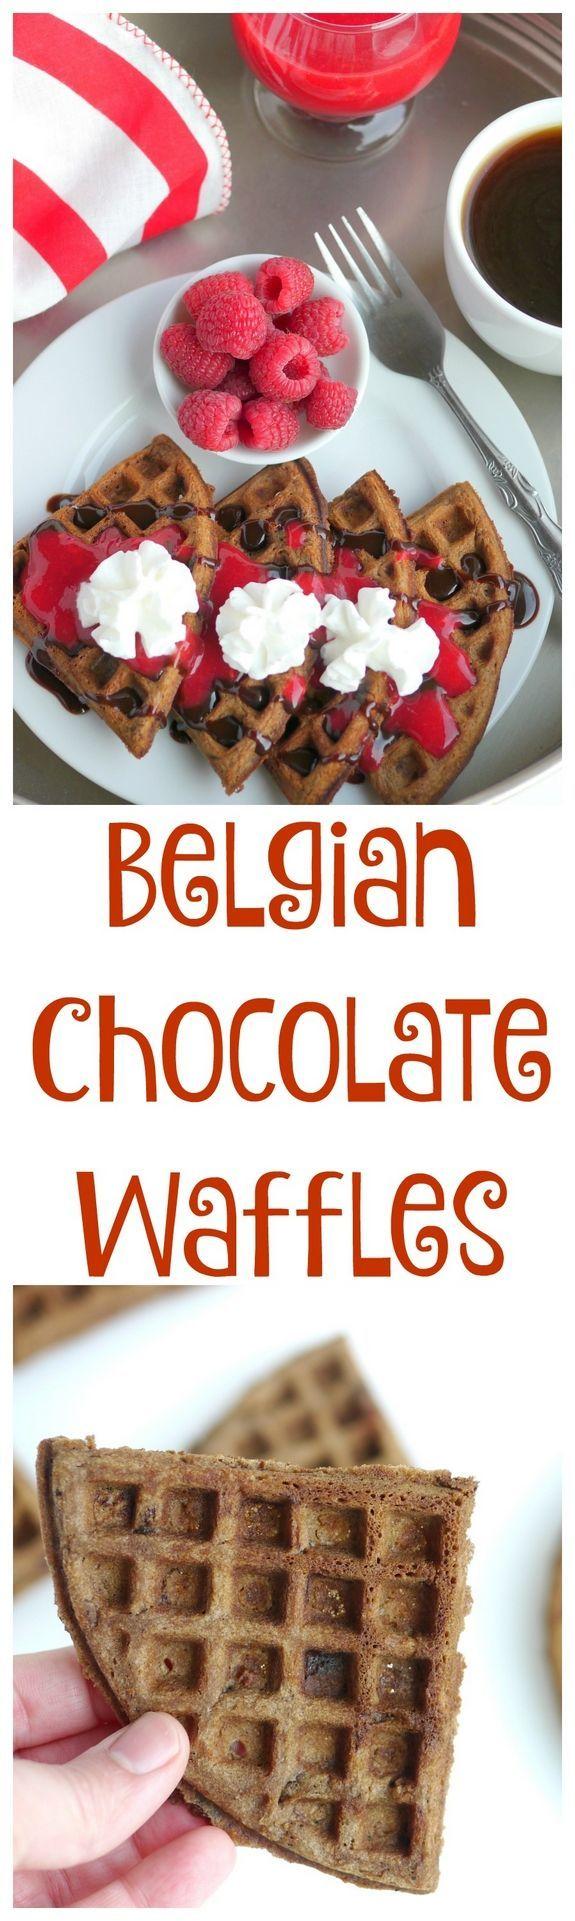 Belgian Chocolate Waffles with Homemade Raspberry Sauce